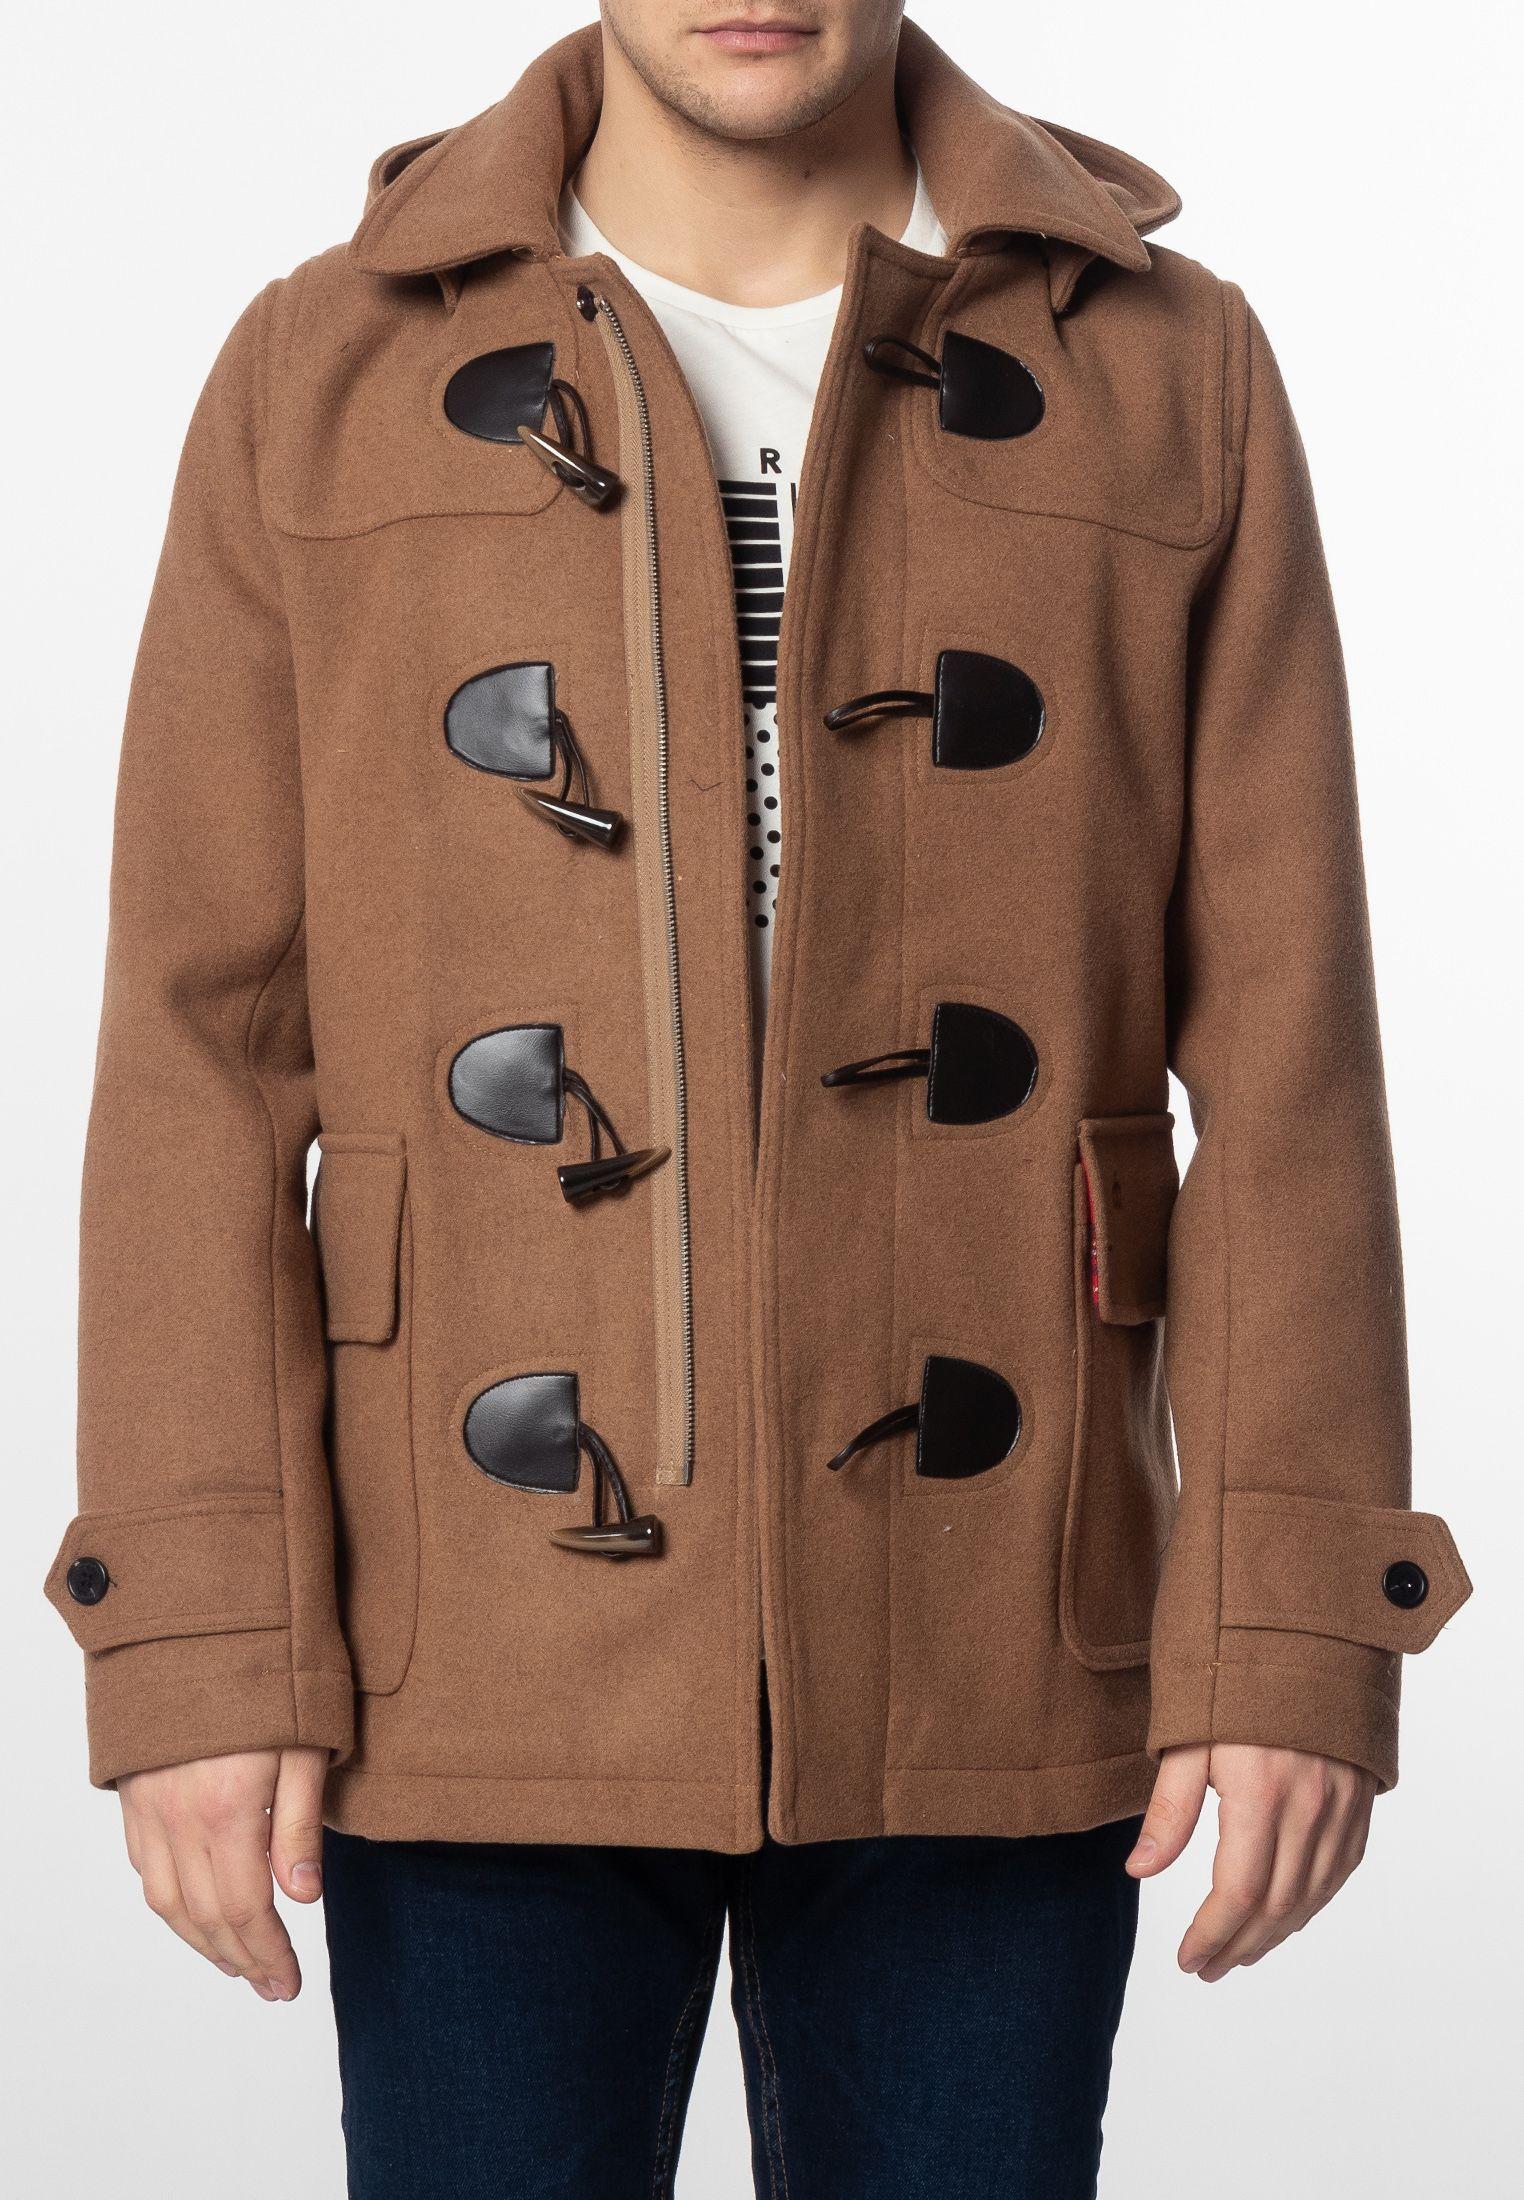 Bonner Mens Short Duffle Coat With Detachable Hood In Tan